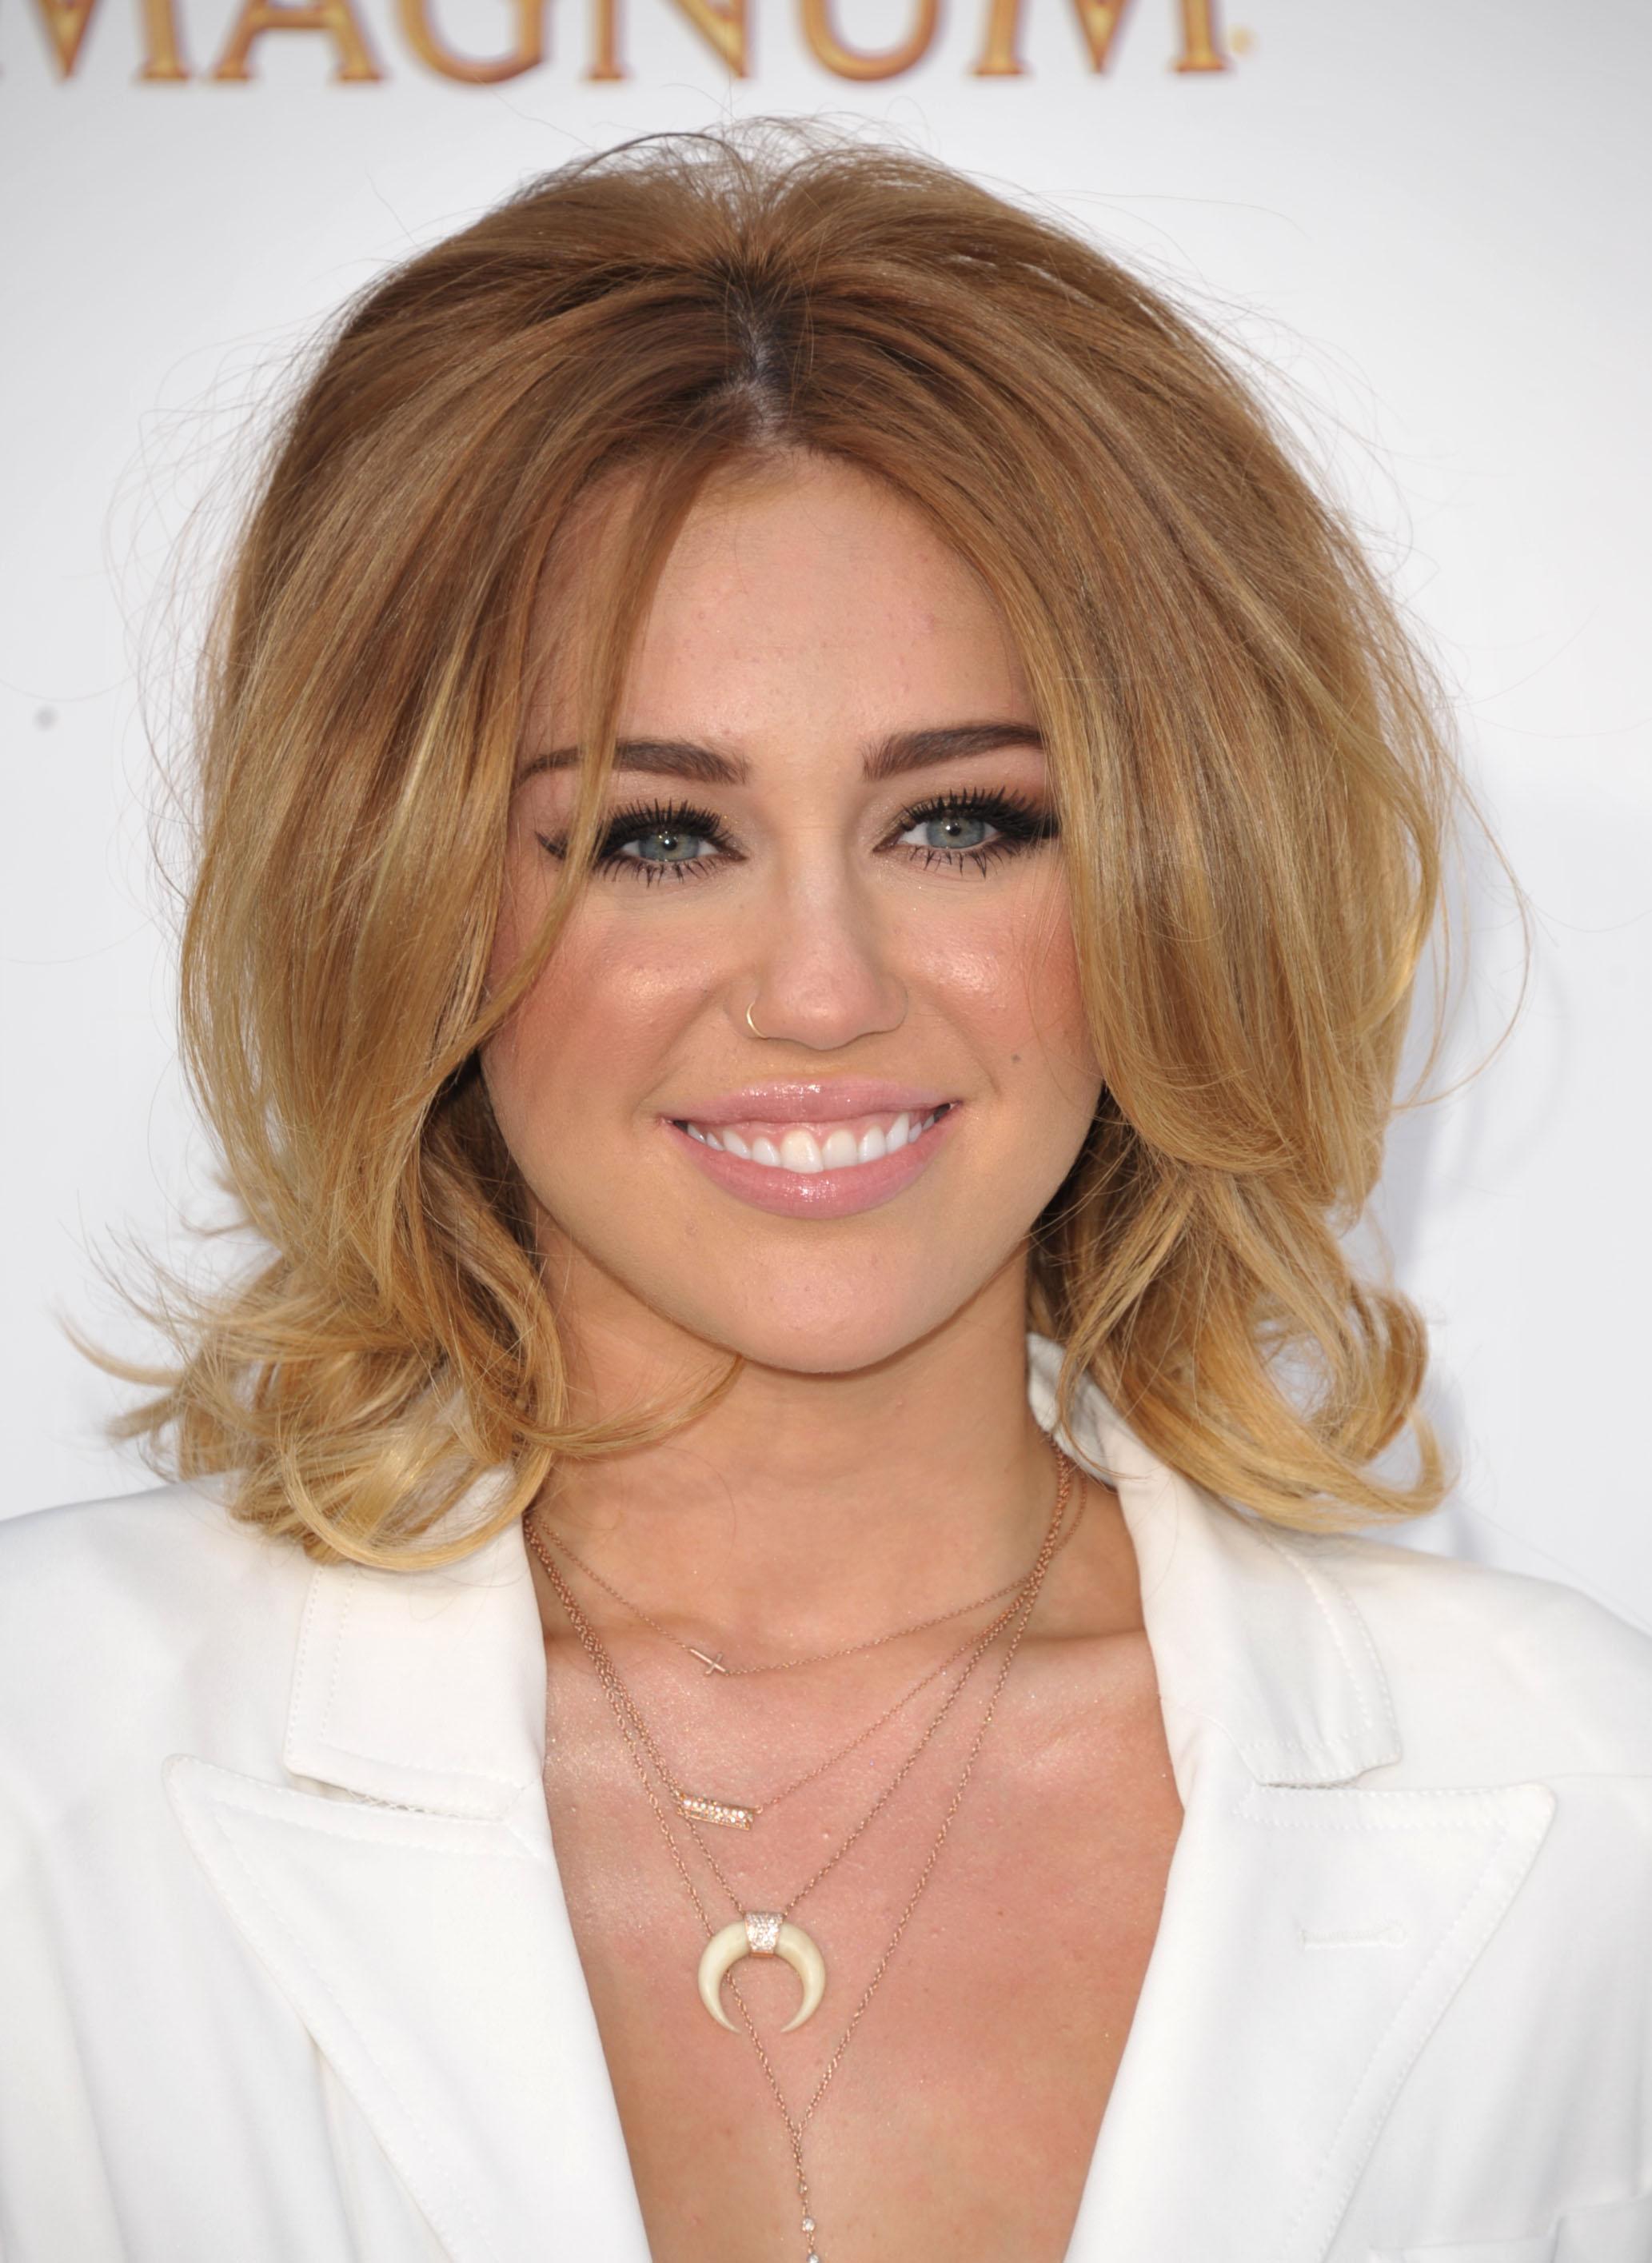 new hair cyrus Miley